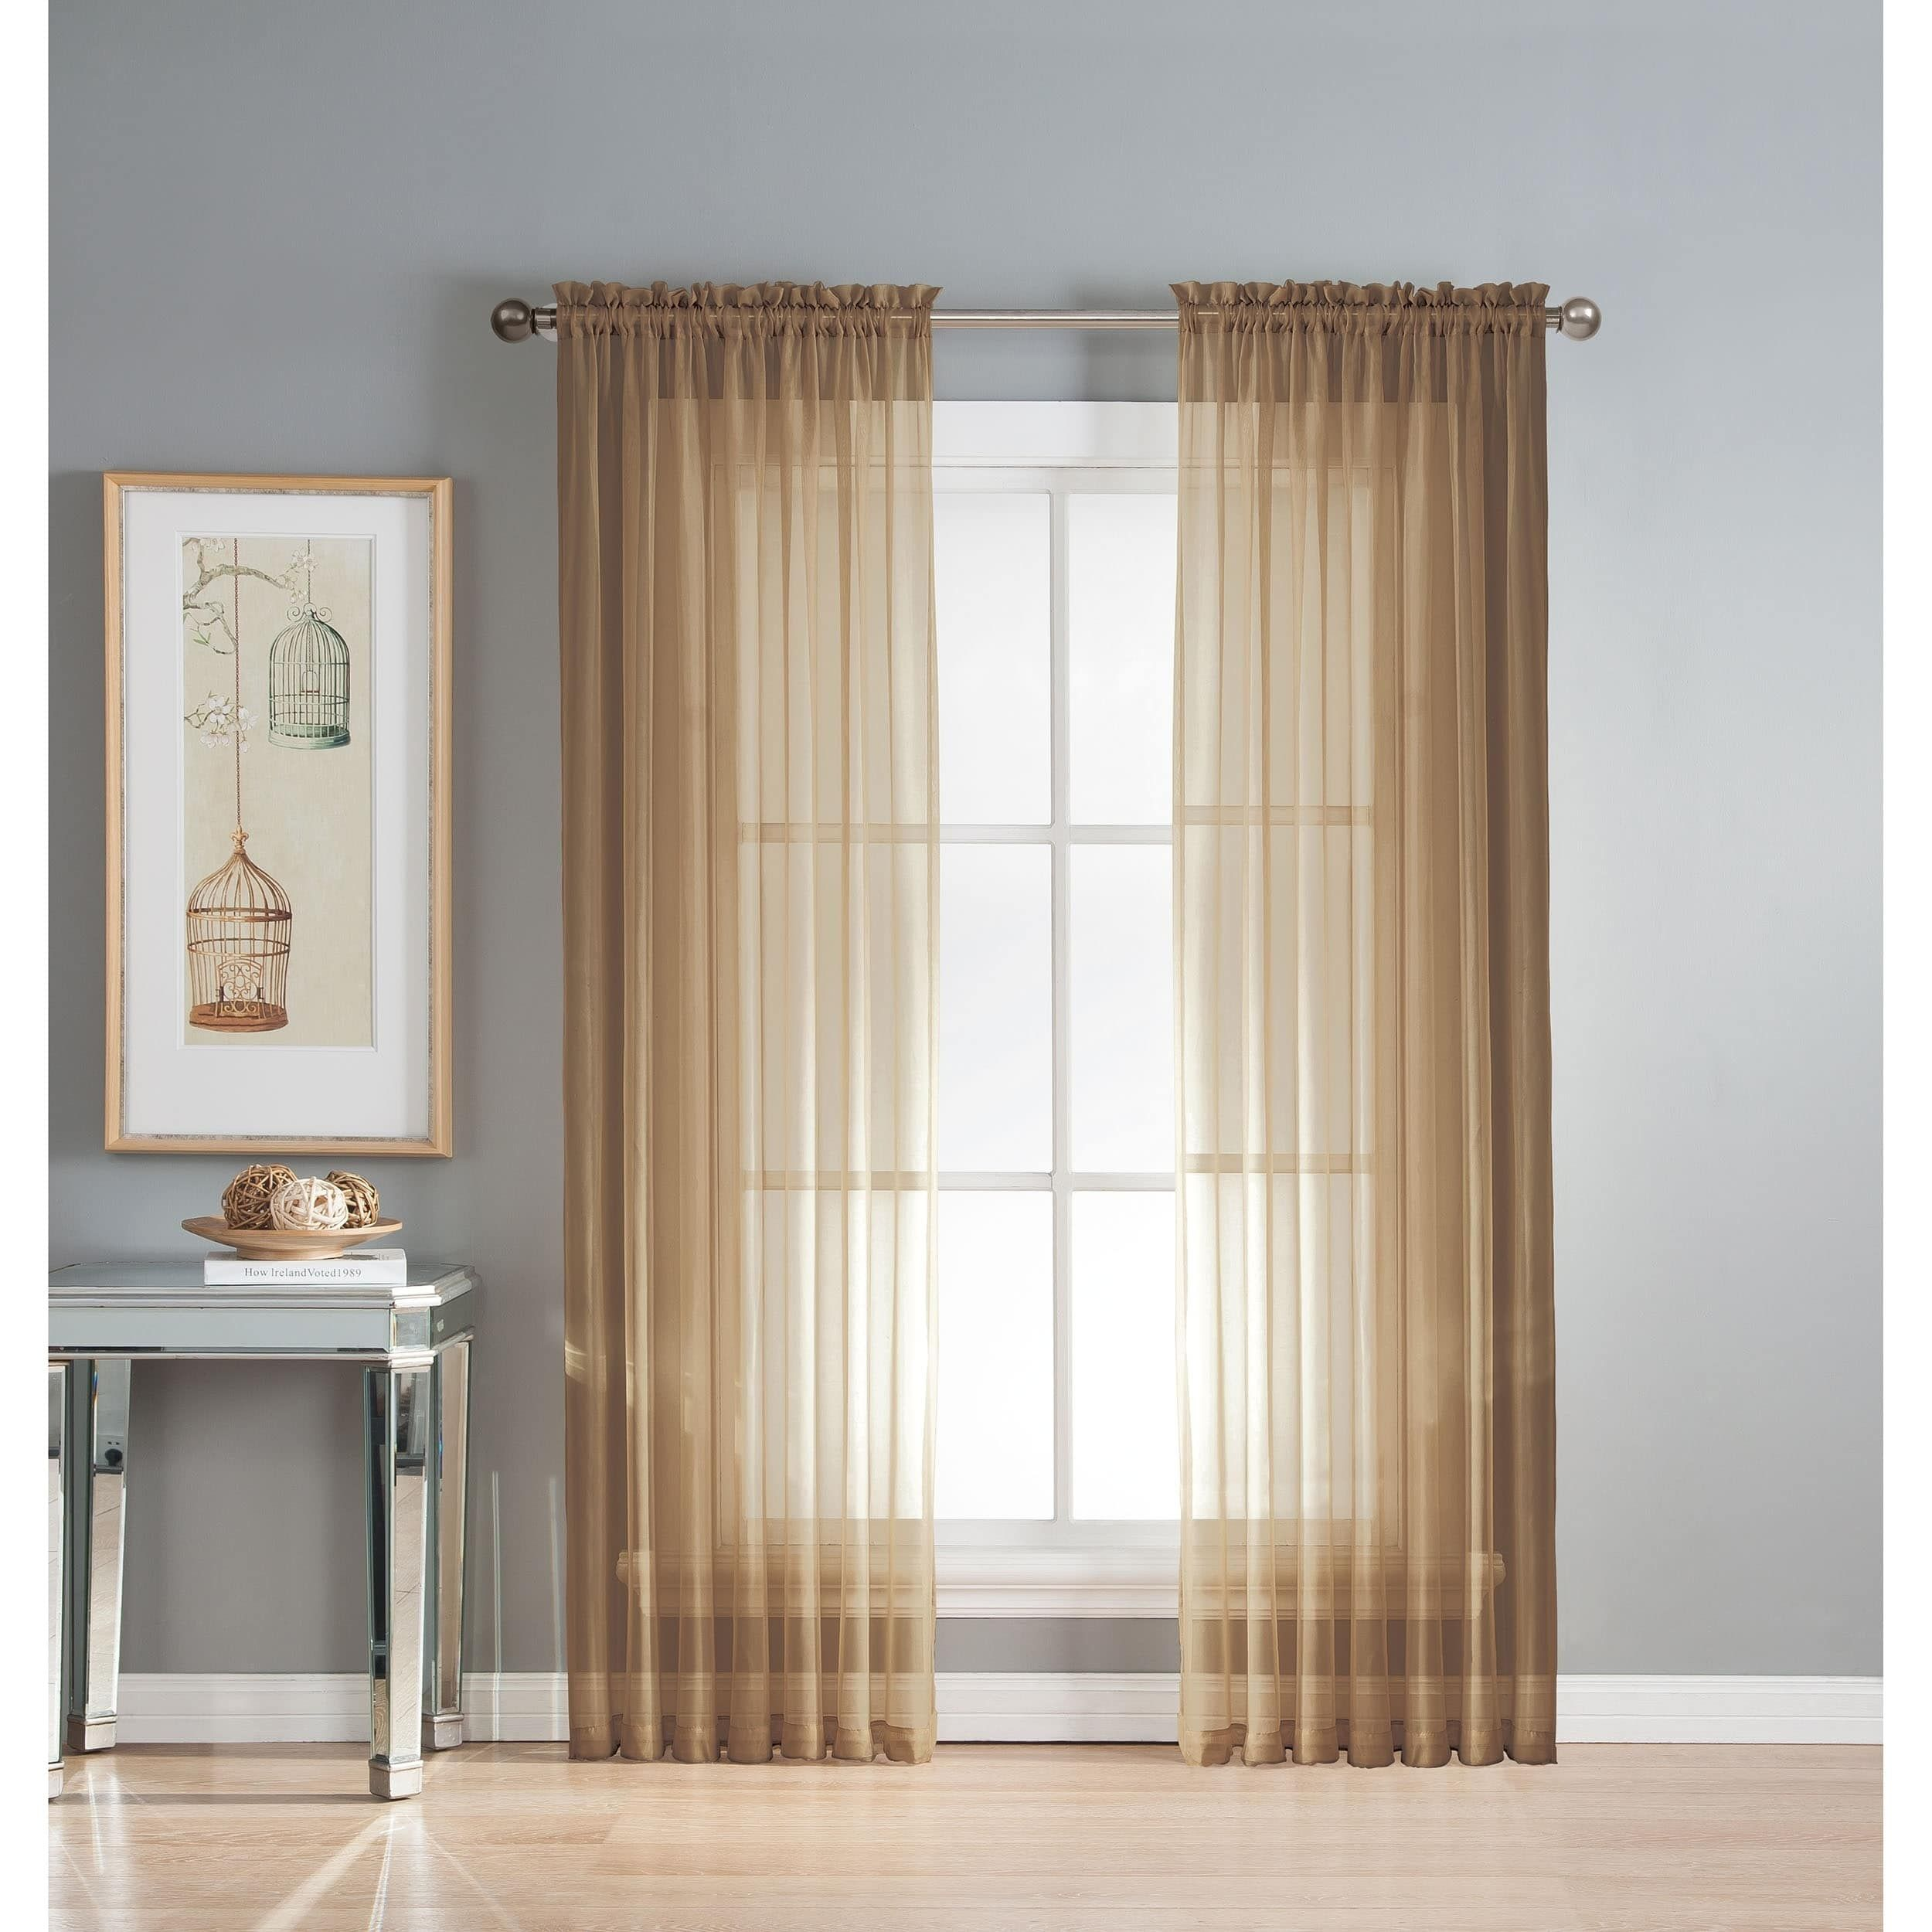 rugs white gb blinds ikea sheer curtain matilda cm products curtains art voile textiles en pair